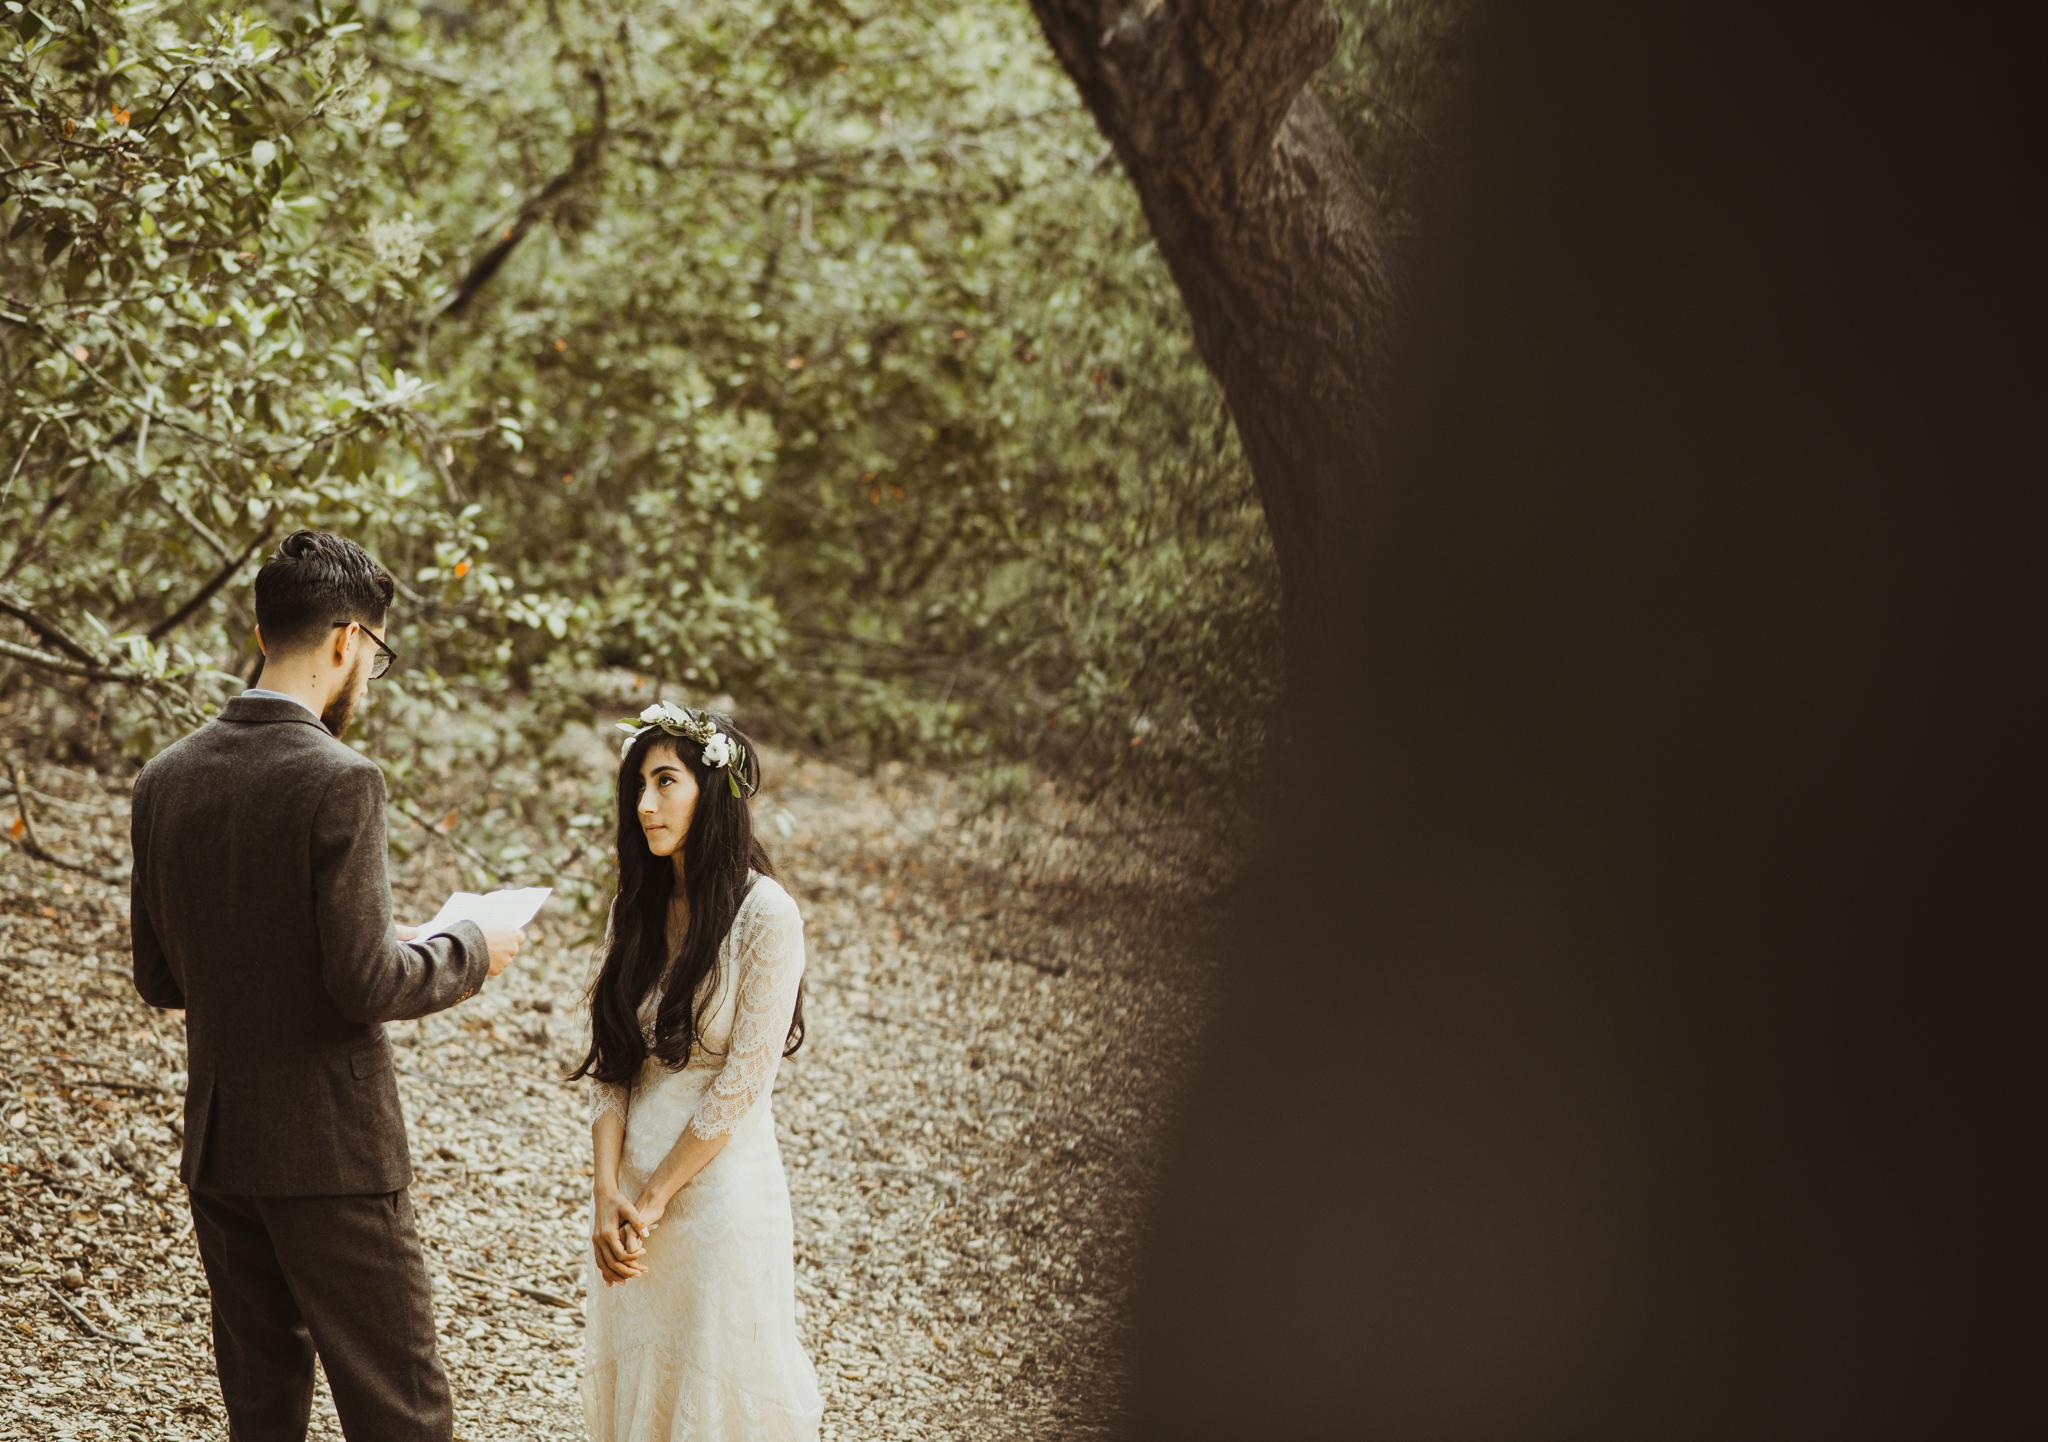 ©Isaiah-&-Taylor-Photography---Oak-Canyon-Nature-Center-Wedding,-Anaheim-Hills-014.jpg